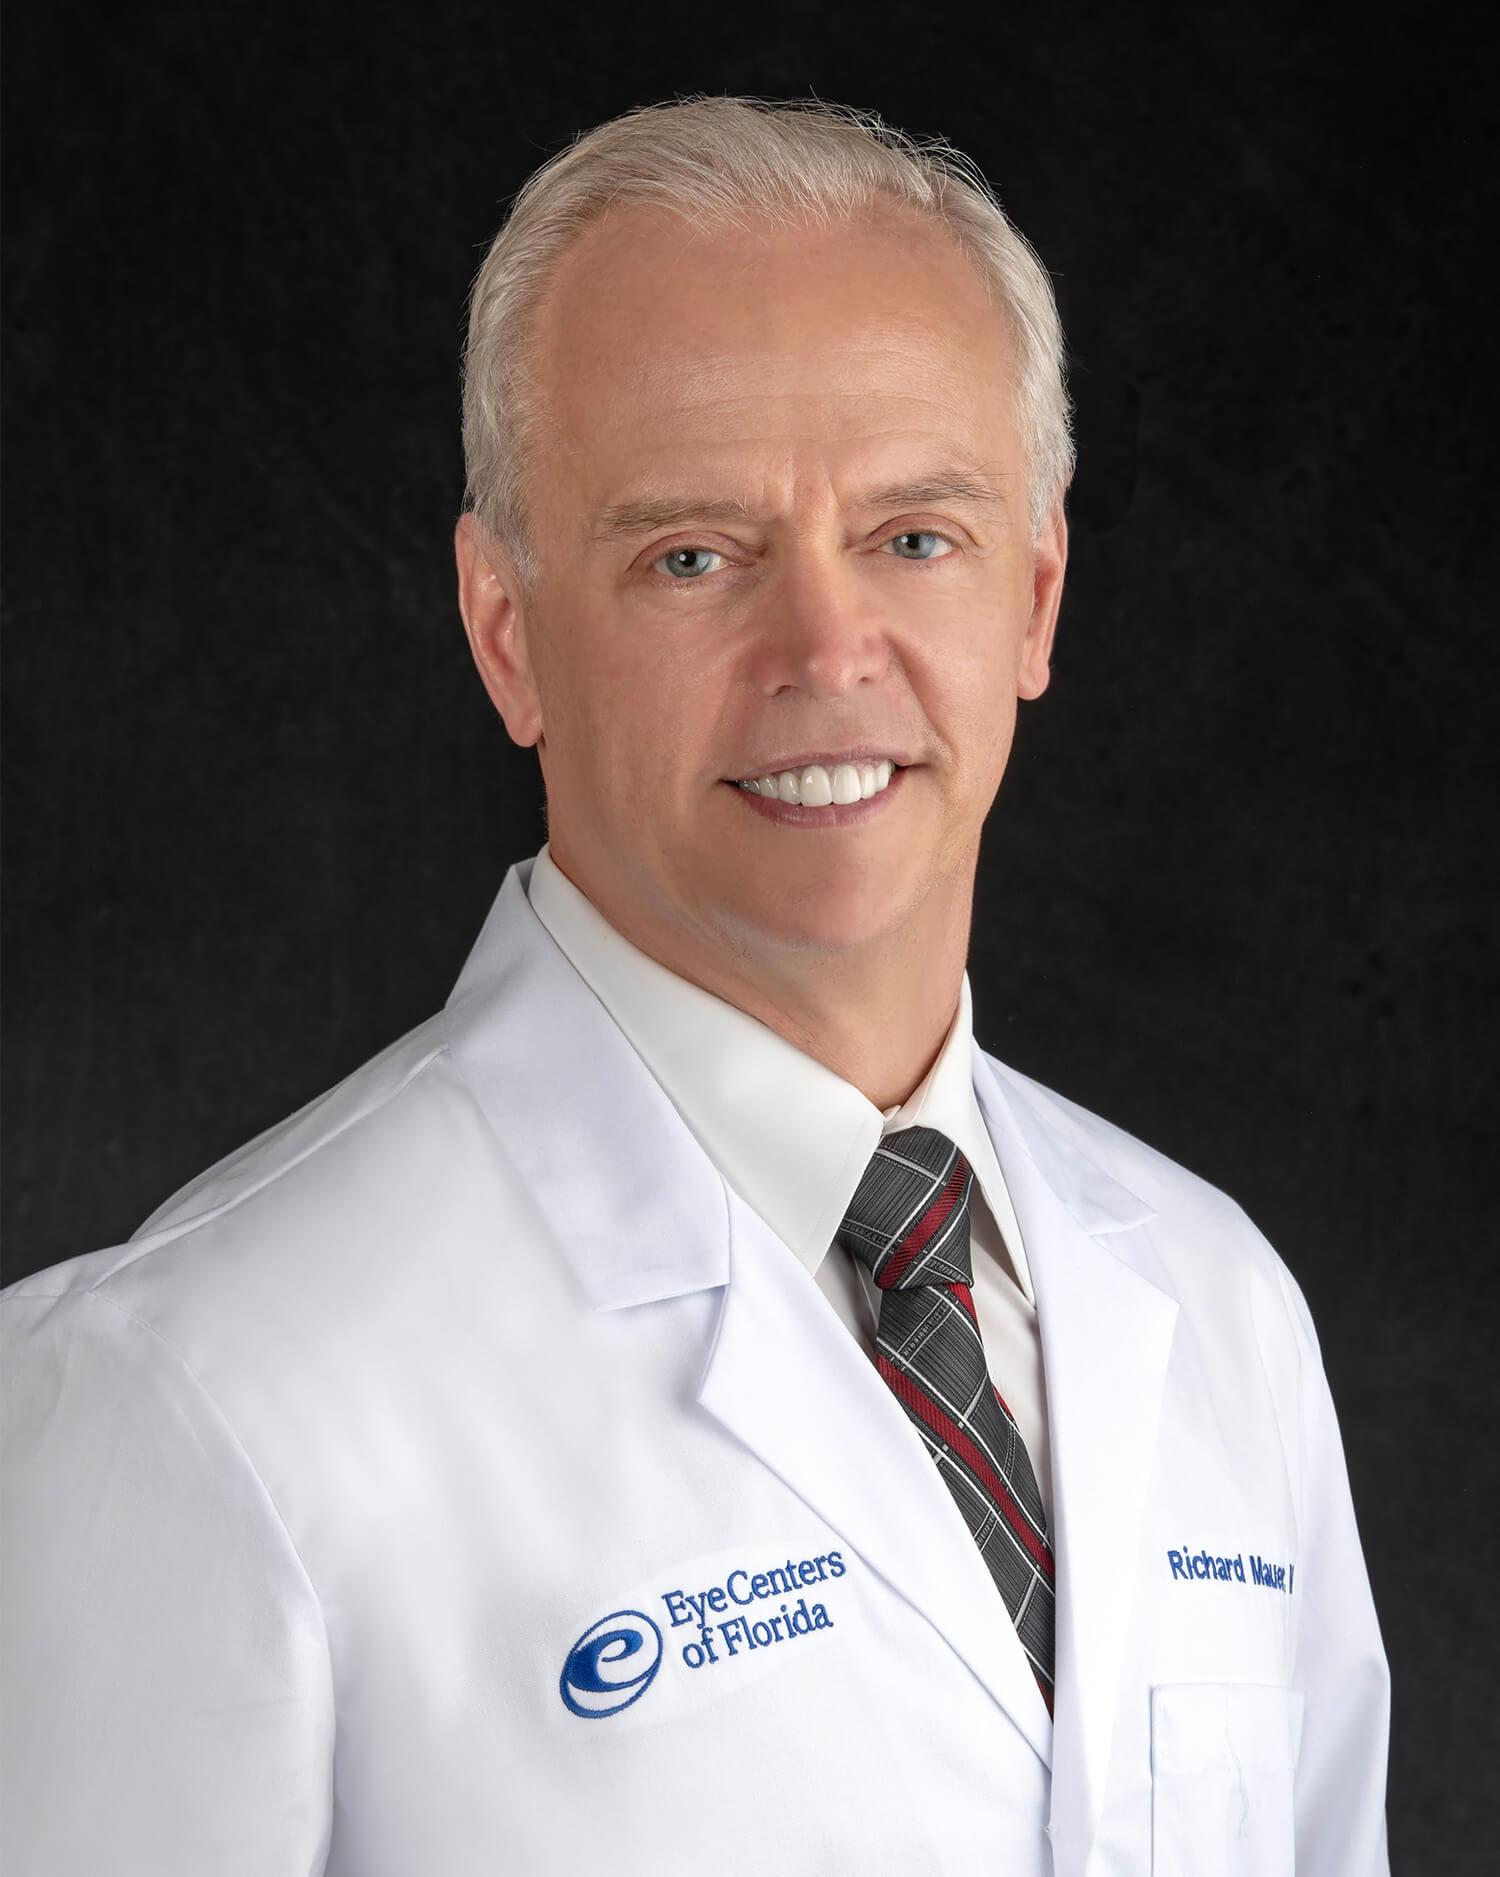 Dr. Richard Mauer, MD